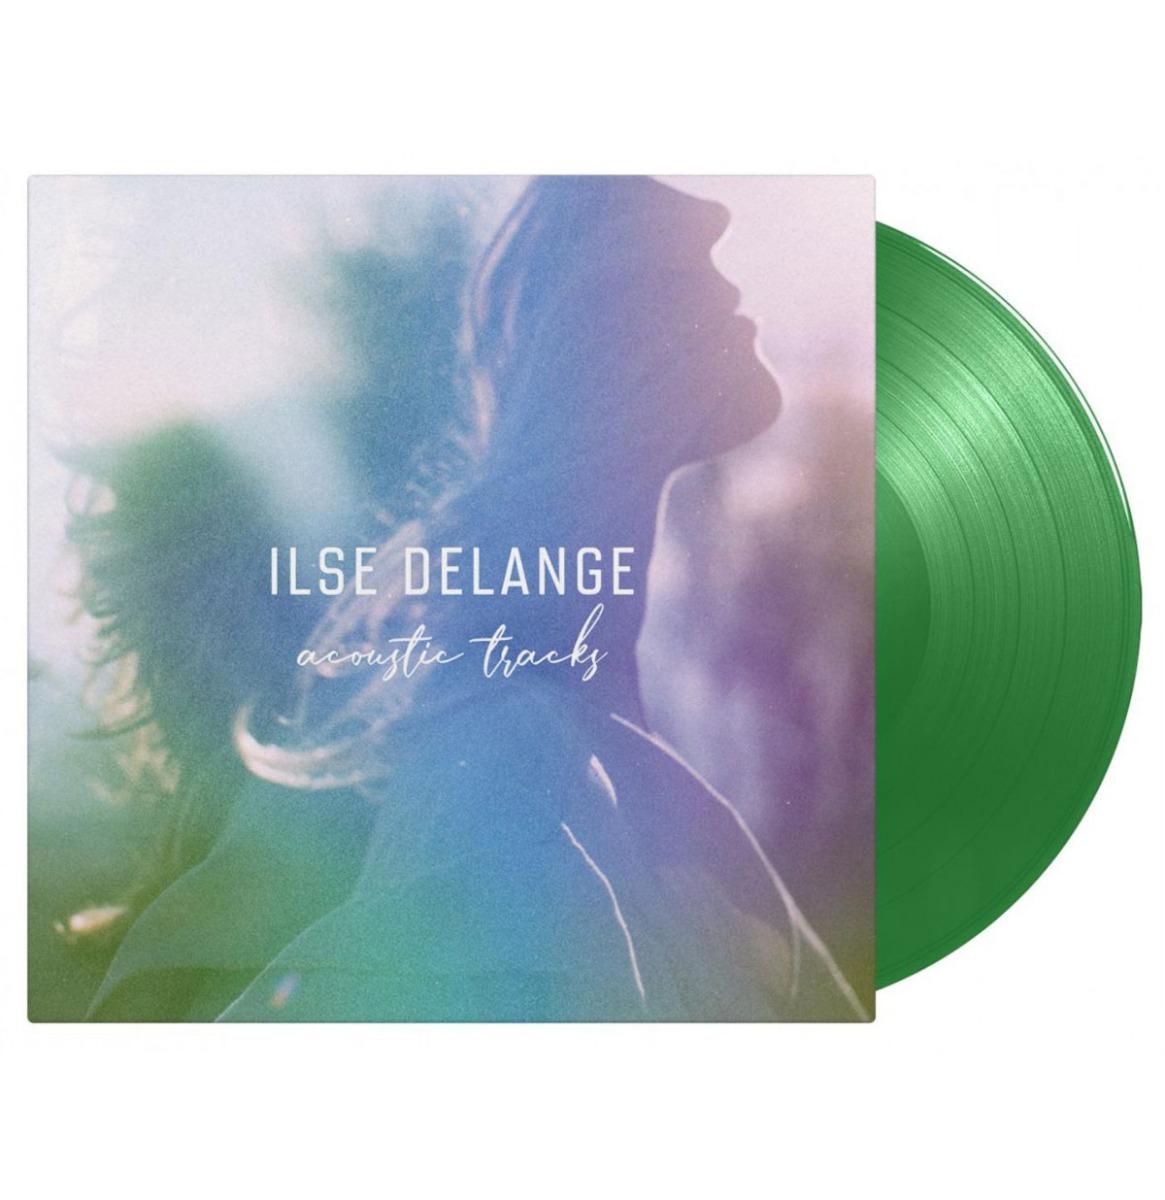 Ilse DeLange - Acoustic Tracks 10 Vinyl